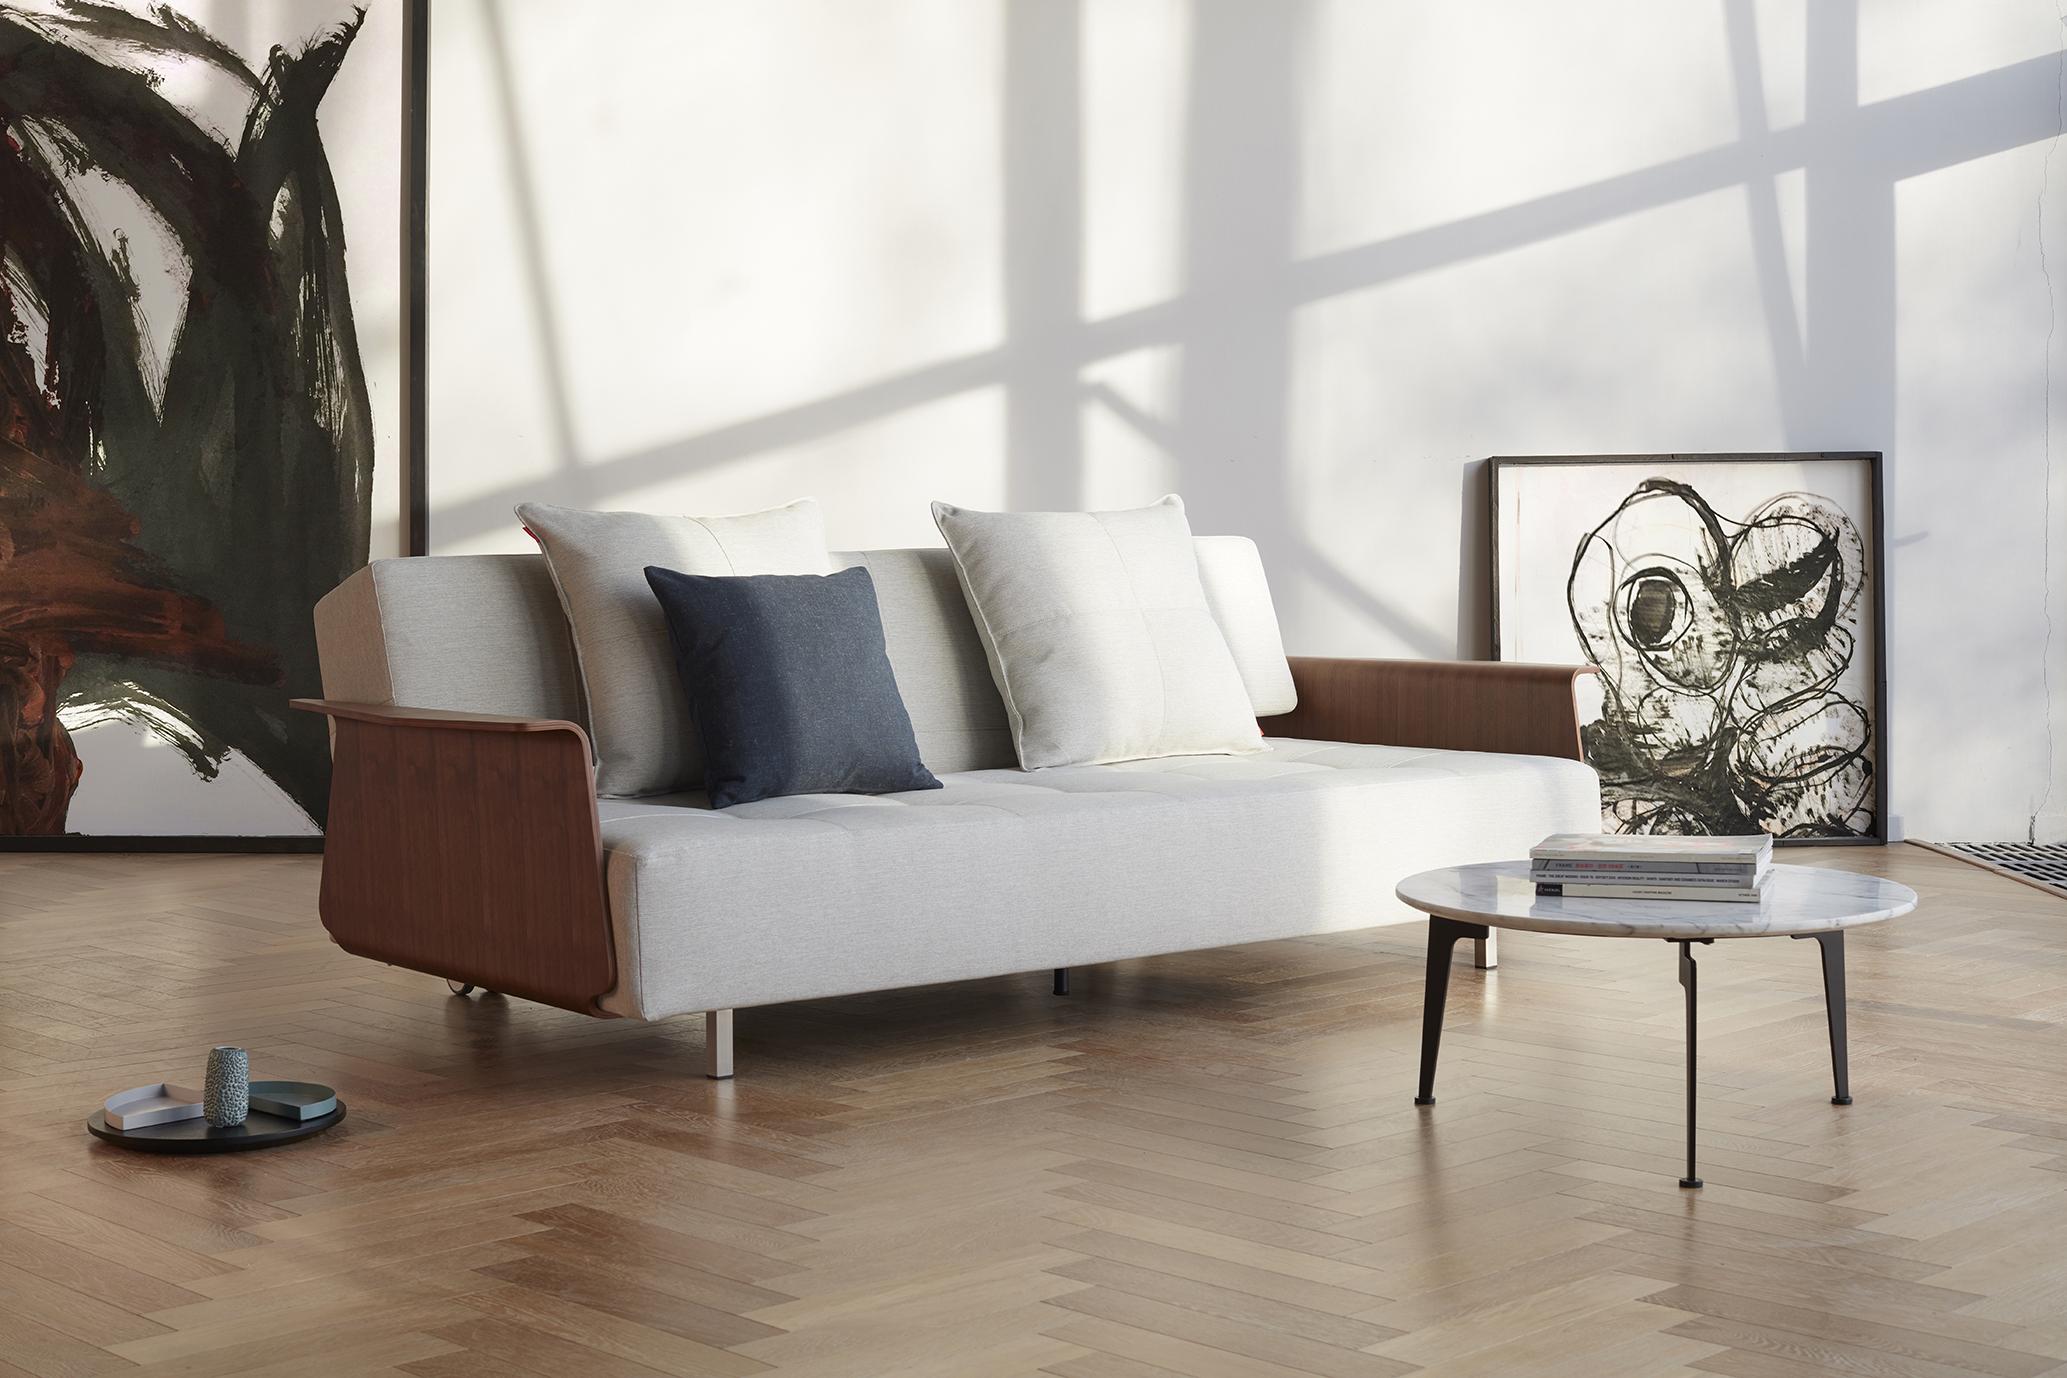 Long-horn-sofa-bed-oliver-luaks-weisskrogh-1.jpg